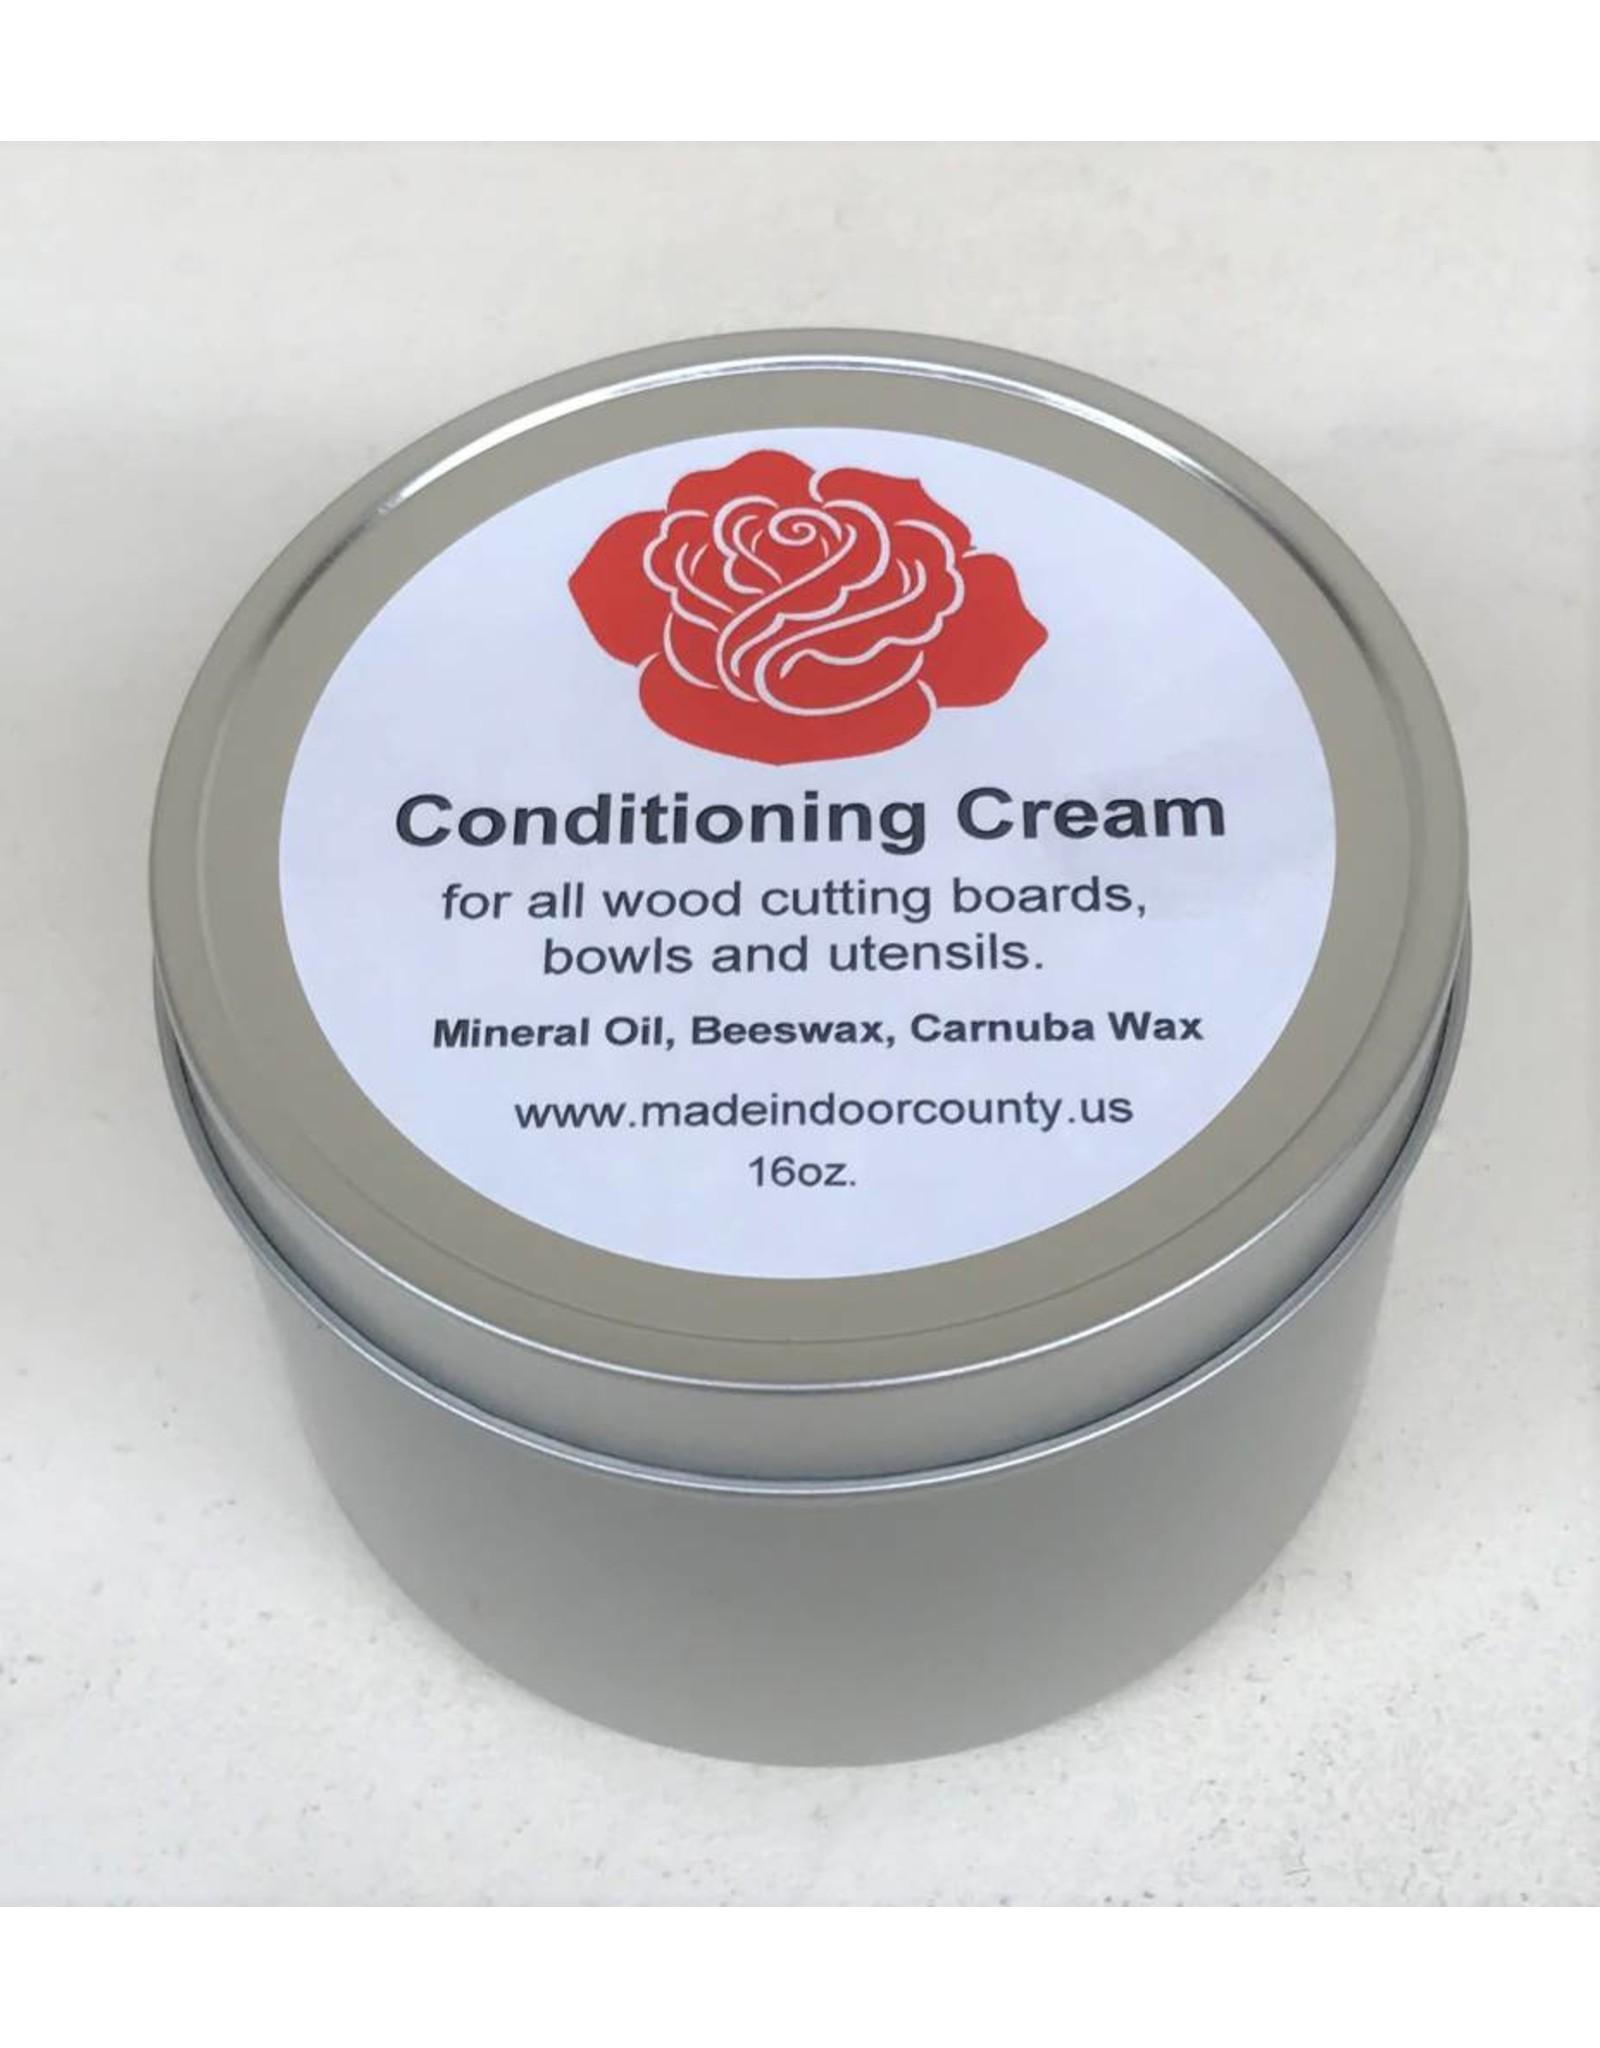 Richard Rose Culinary Conditioning Cream